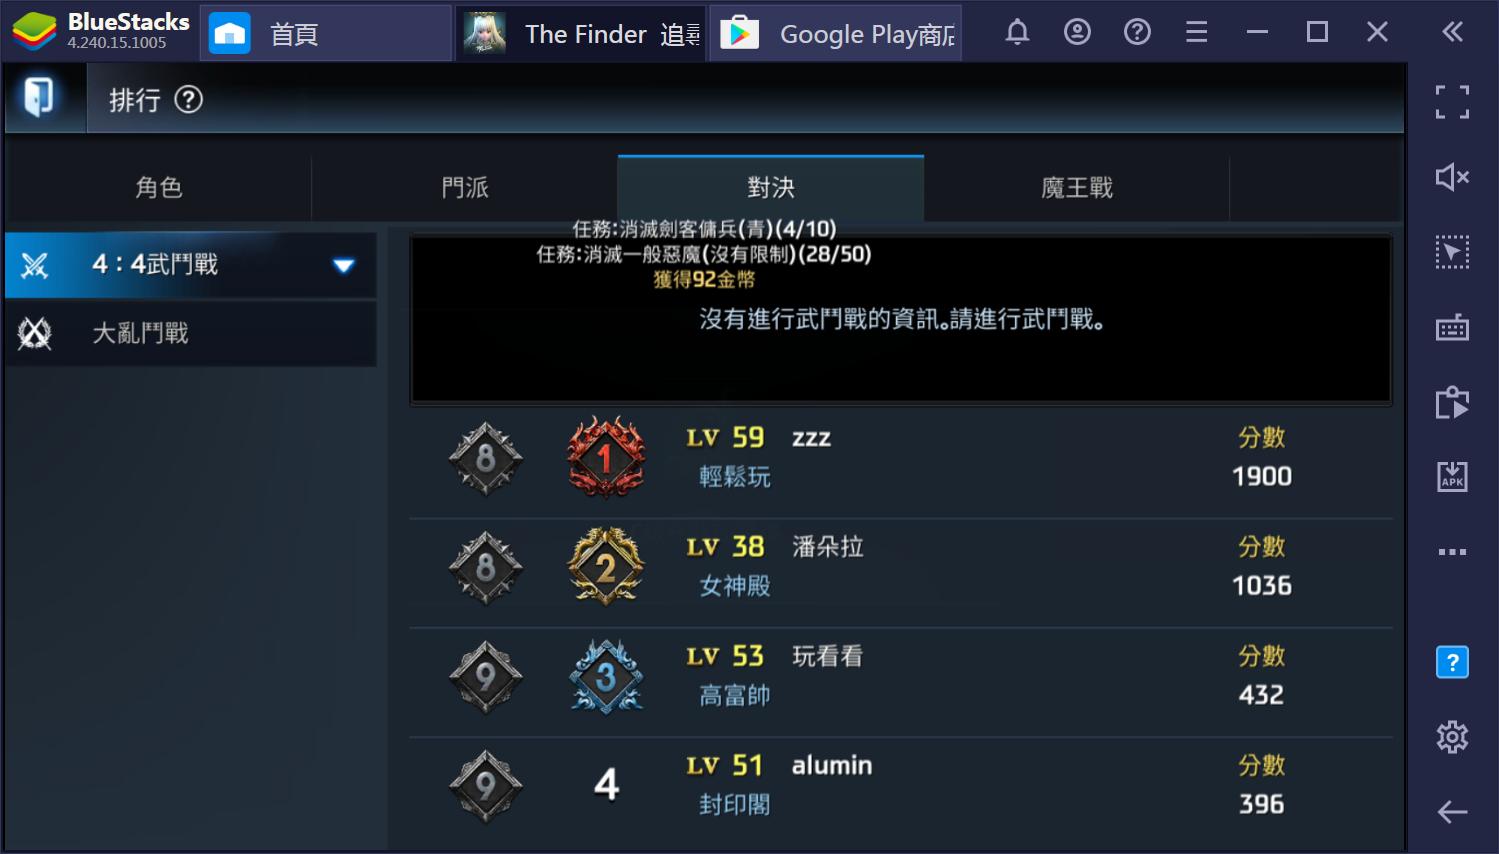 使用BlueStacks在PC上遊玩MMOARPG冒險手遊 《The Finder 追尋者》